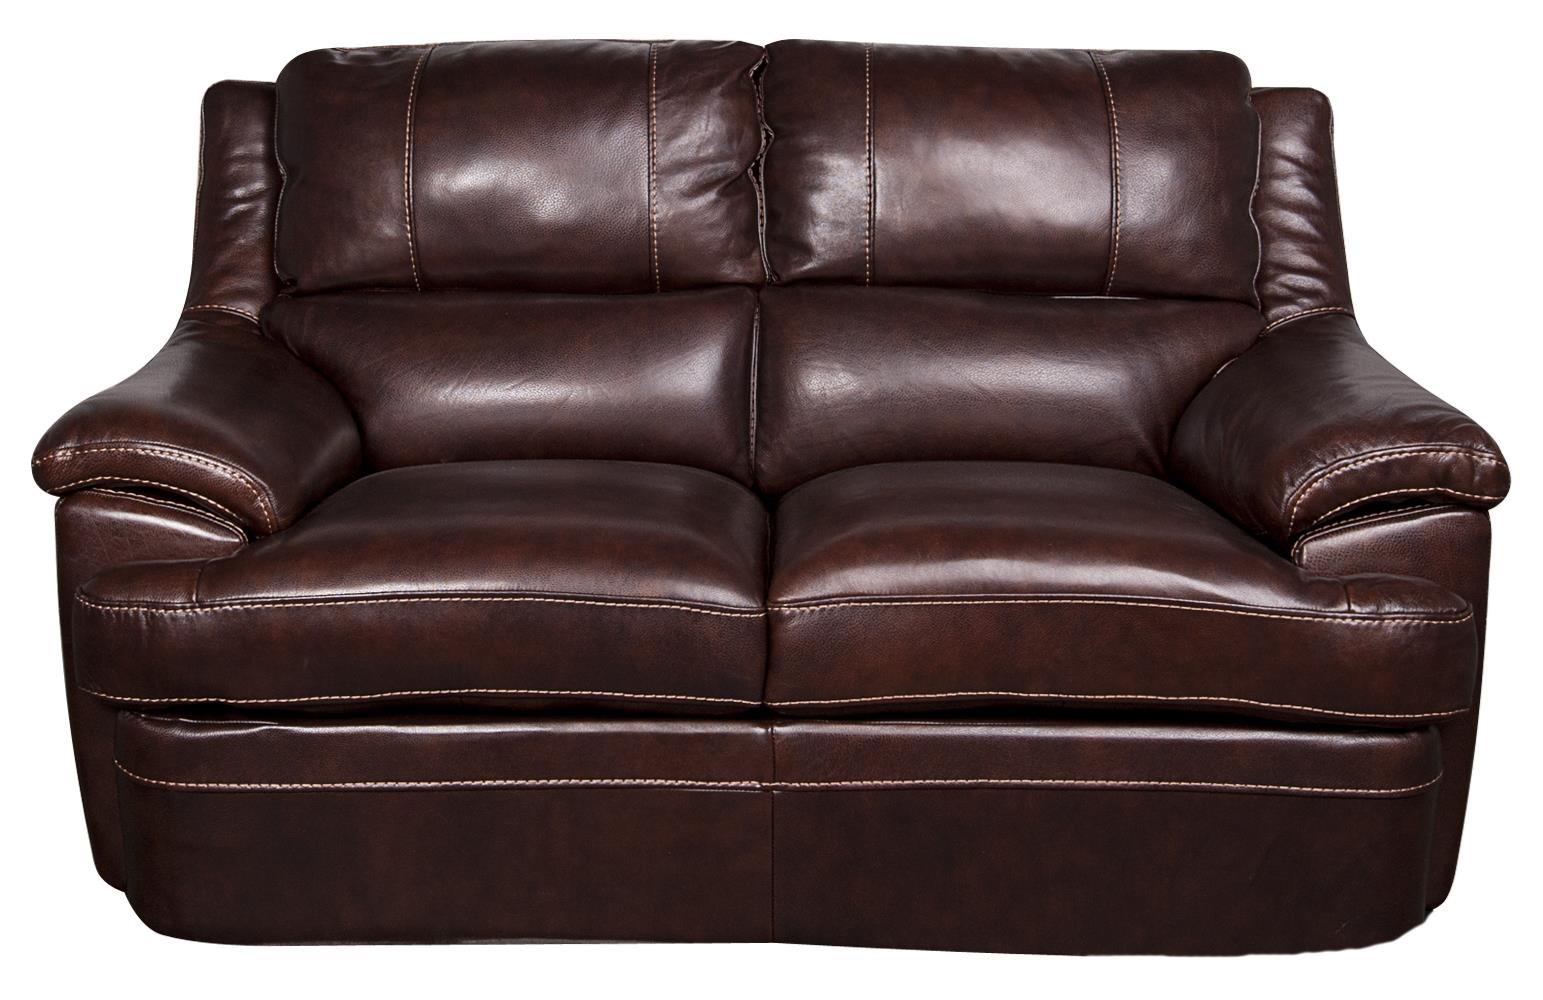 Morris Home Furnishings Zane - Zane Leather-Match* Loveseat - Item Number: 740524957